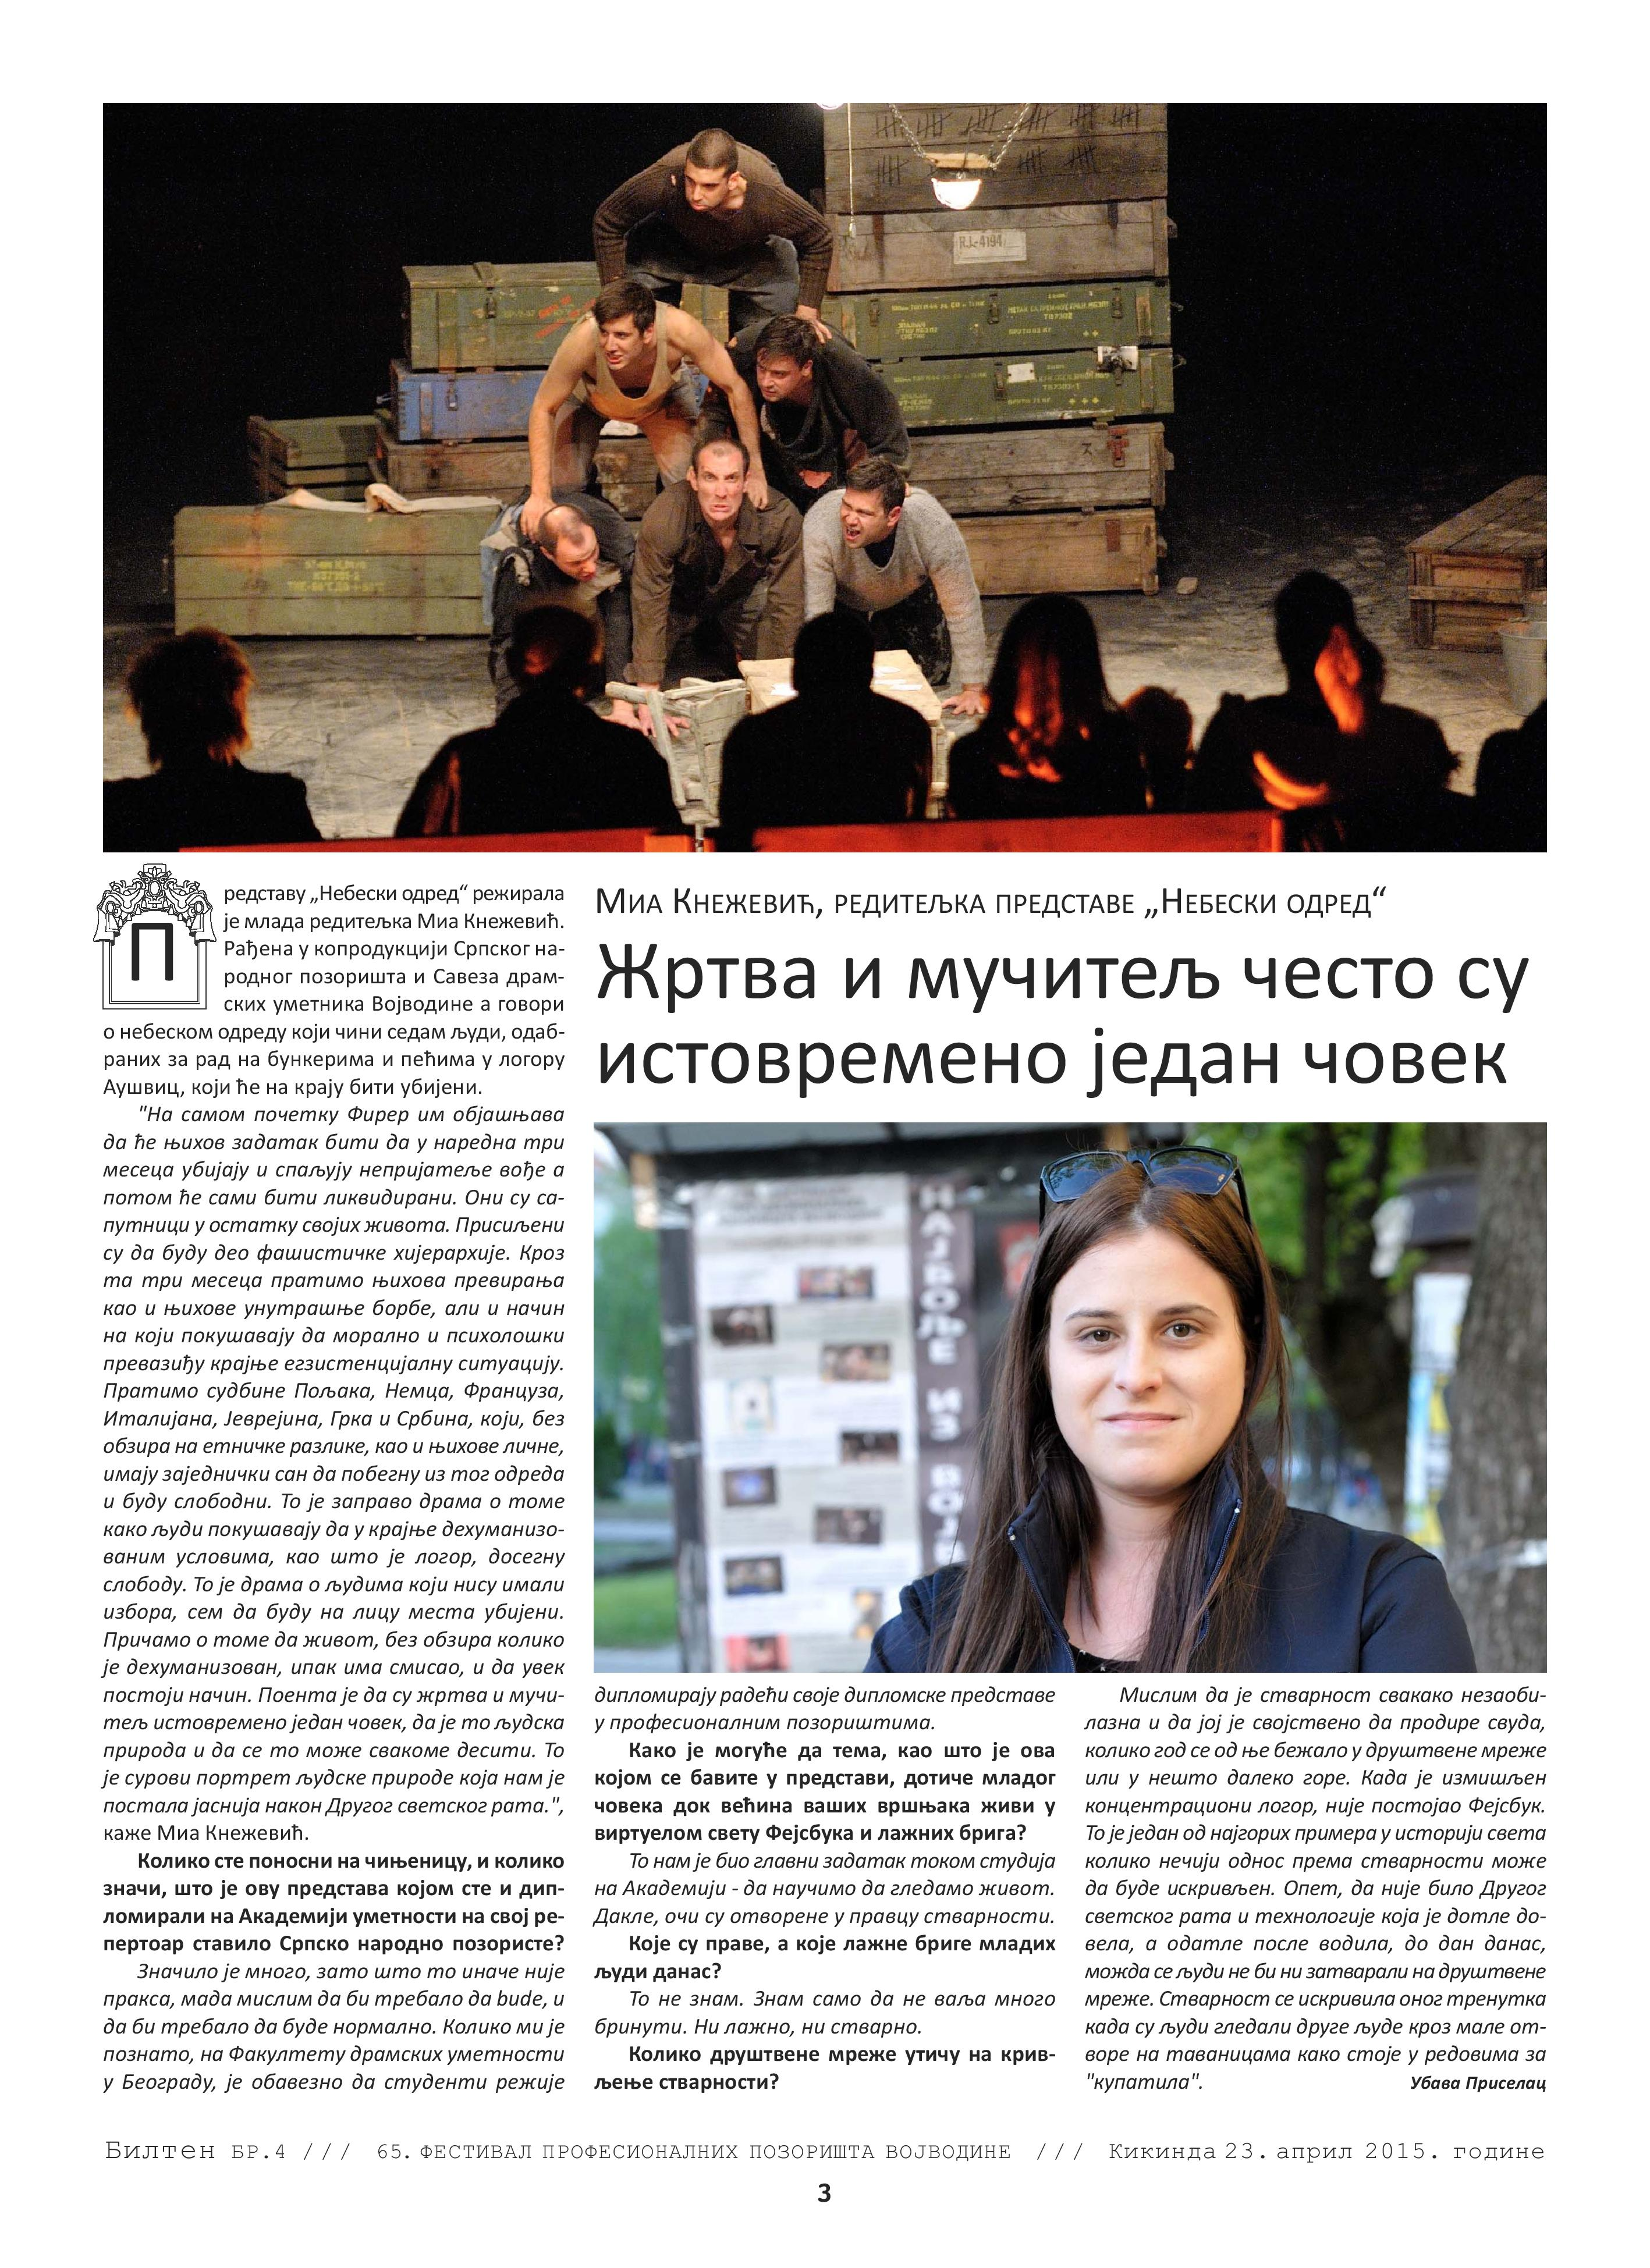 BILTEN_04_23 april_Copy of Layout 2-page-003